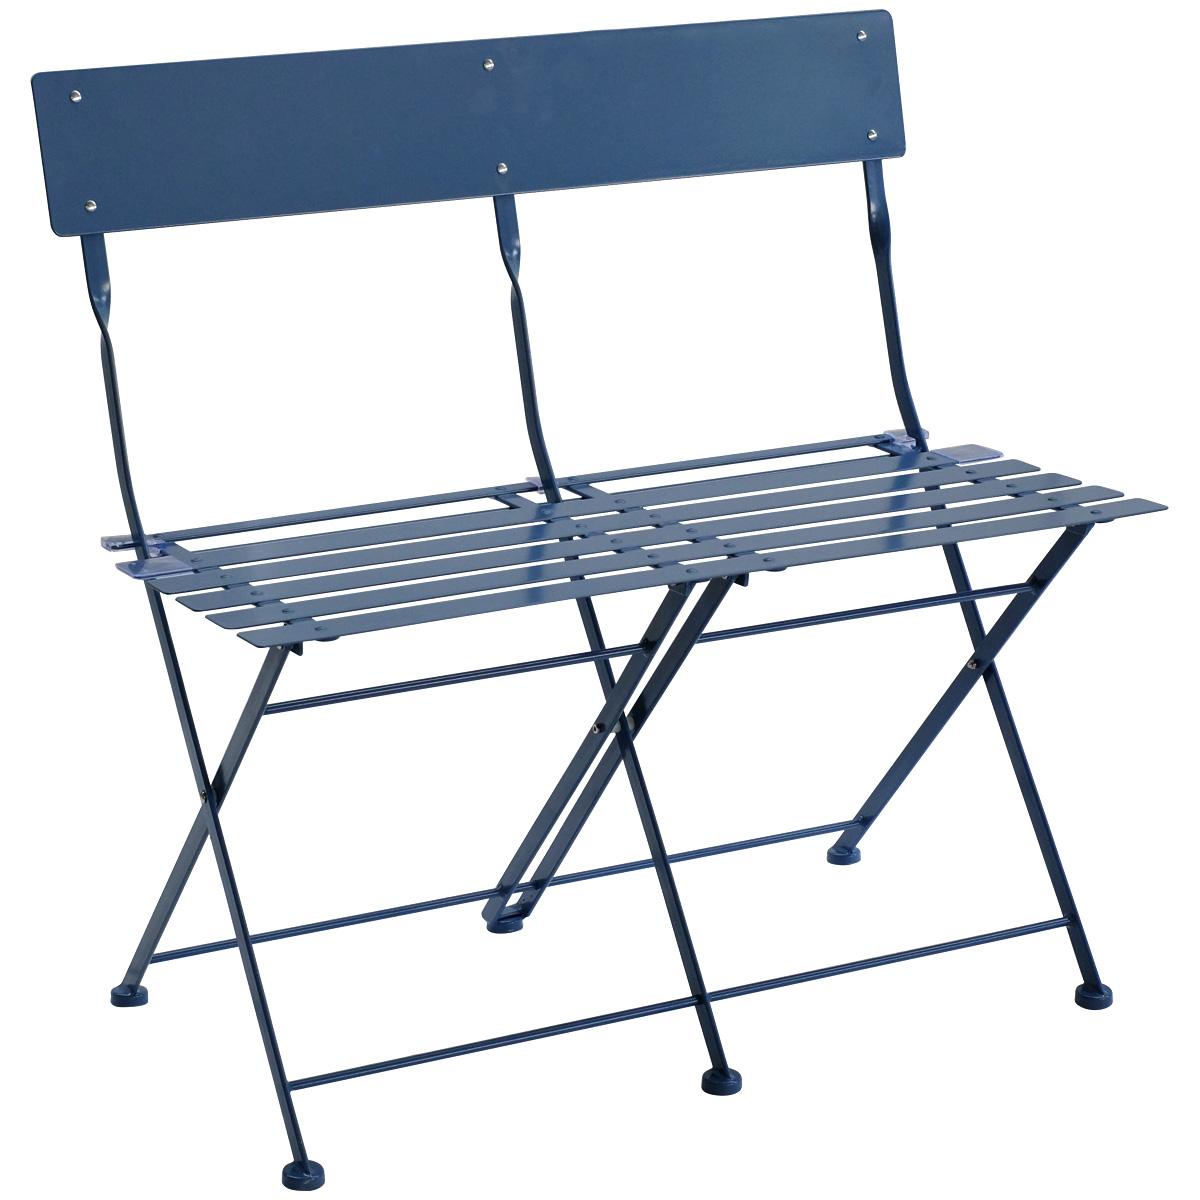 Peachy Details About Charles Bentley 2 Seater Folding Metal Bistro Bench Garden Seat Chair Navy Theyellowbook Wood Chair Design Ideas Theyellowbookinfo